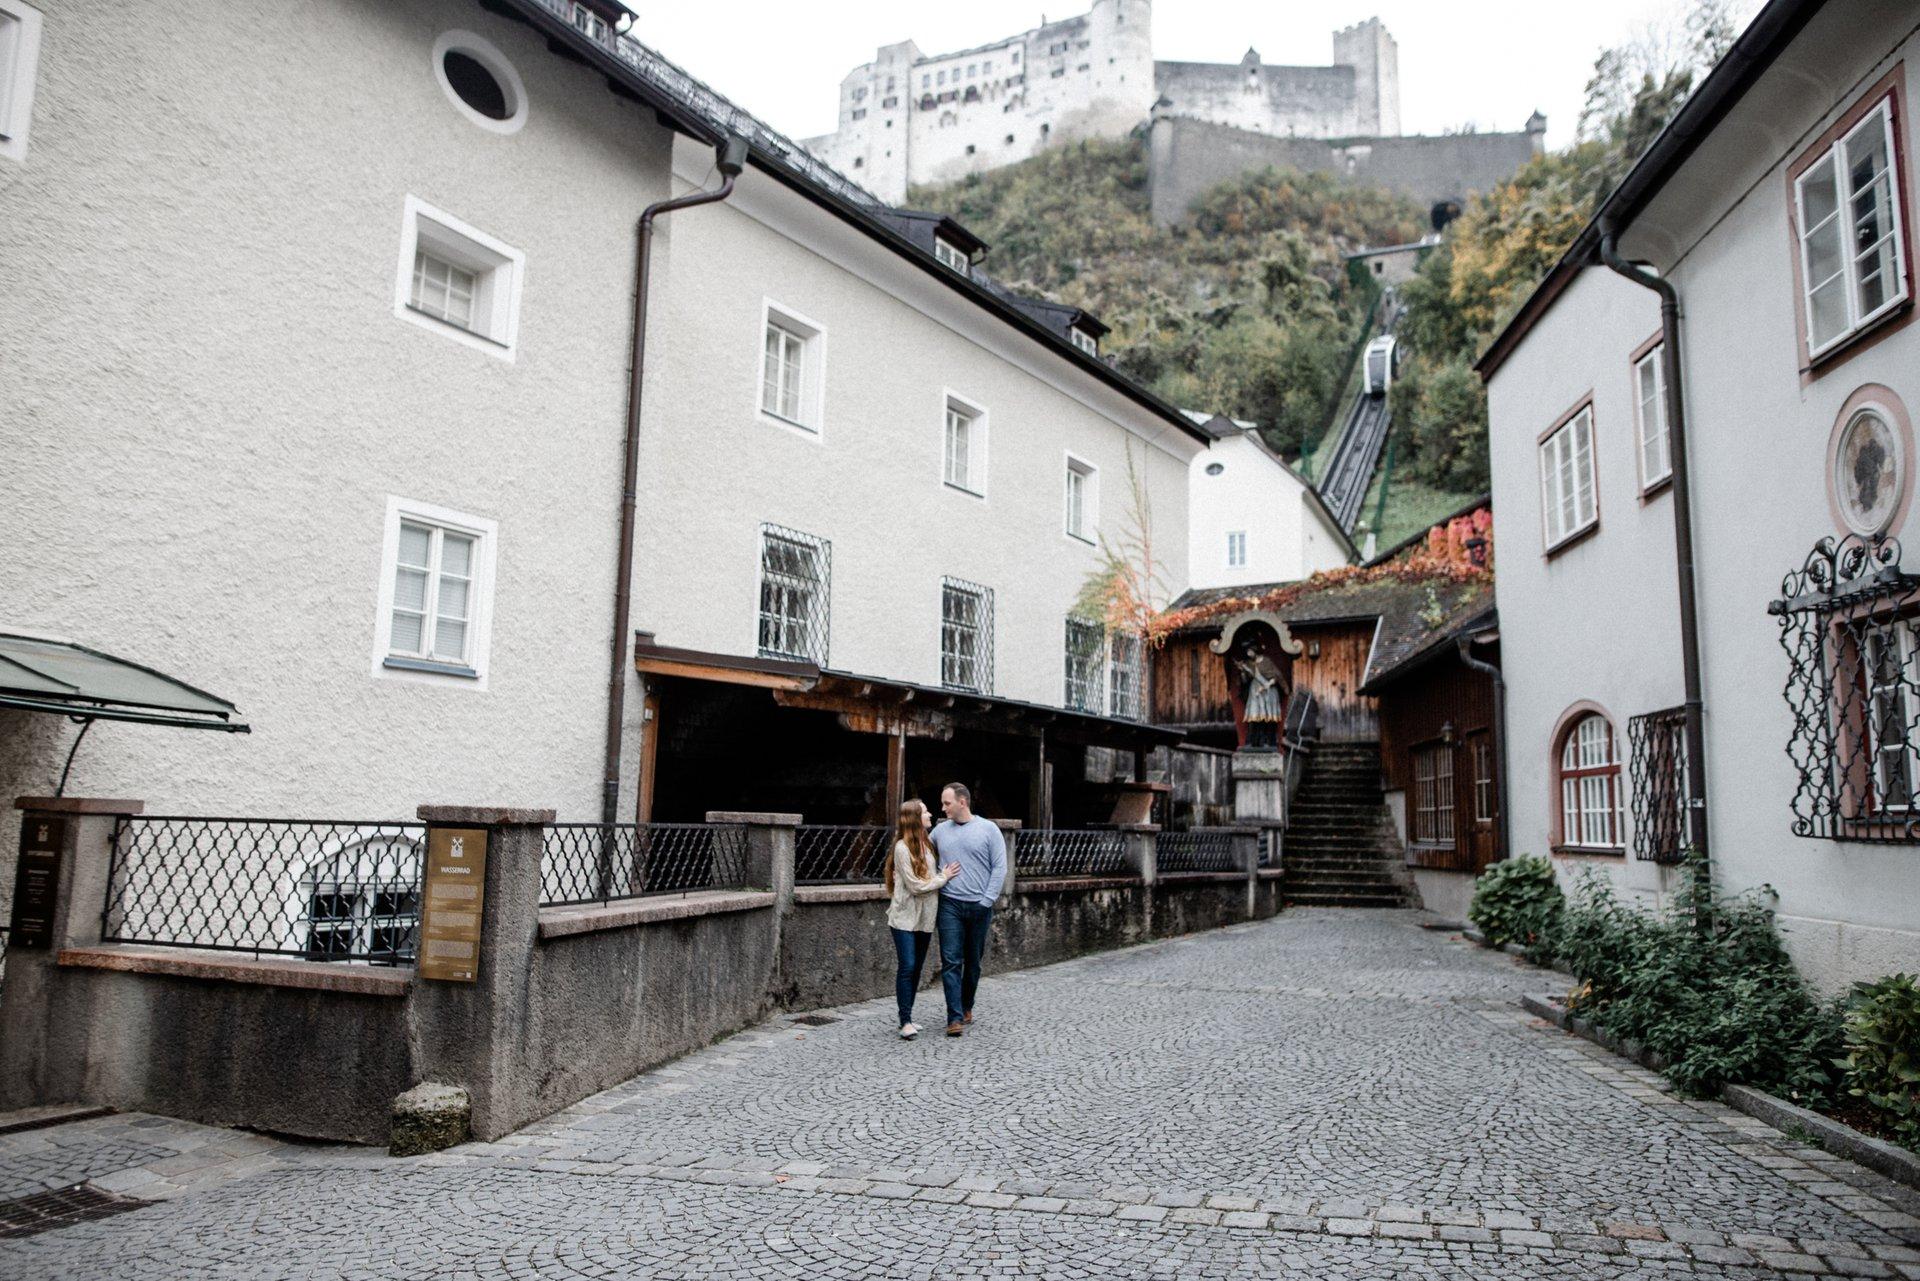 Salzburg-Austria-travel-story-Flytographer-33